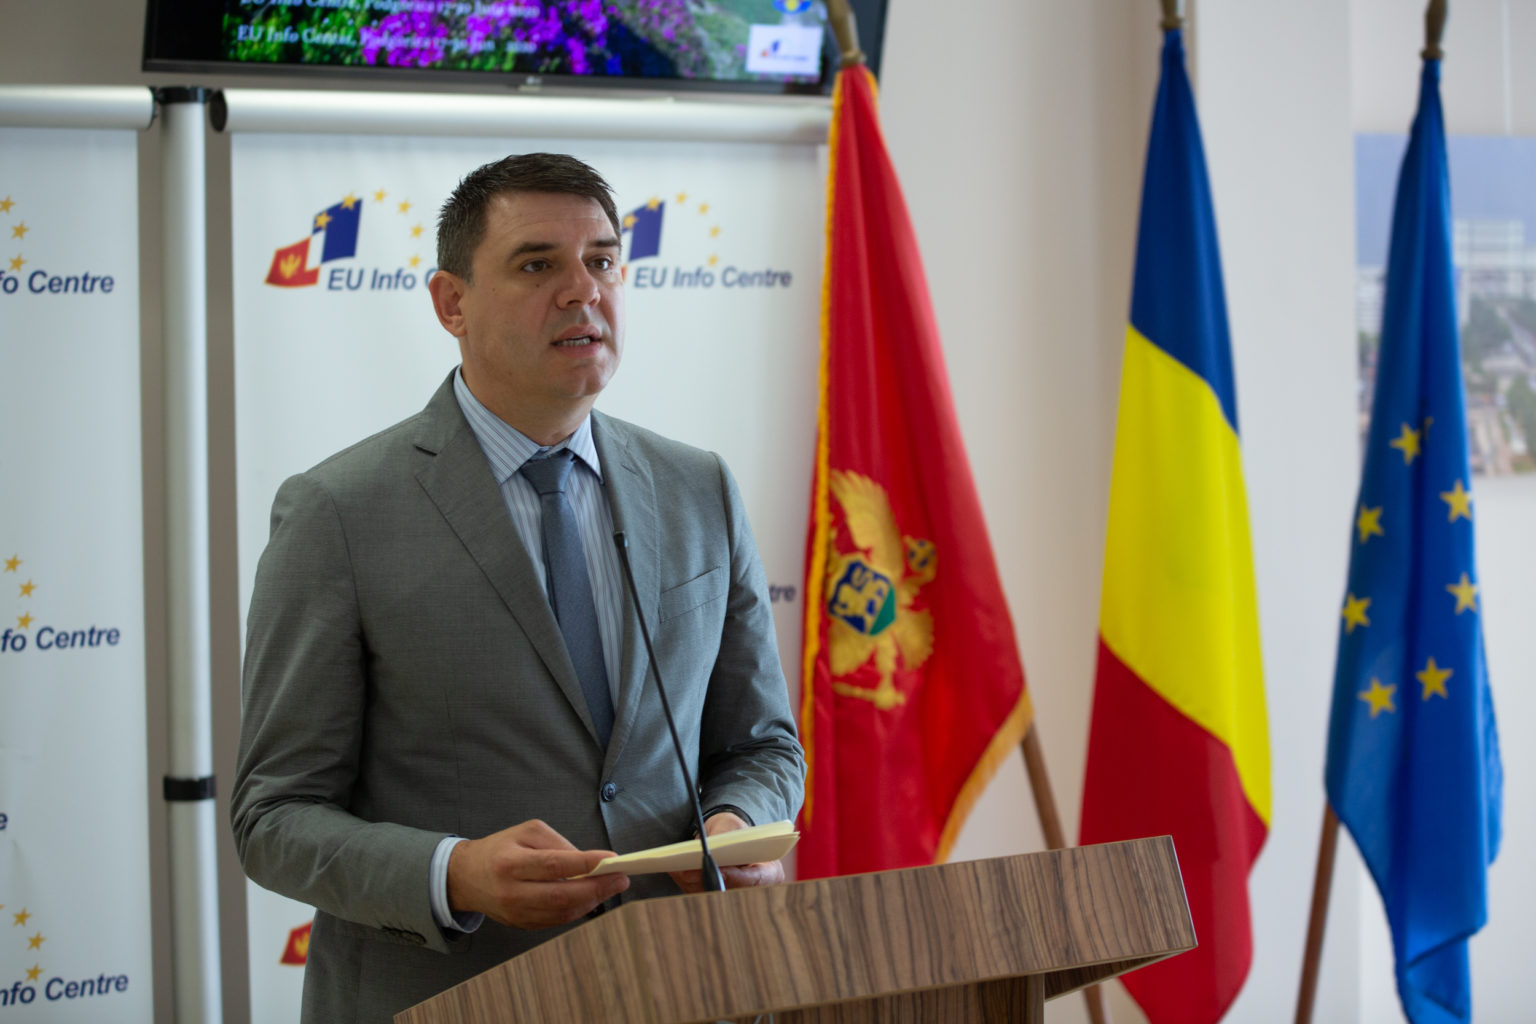 Izlozba Otkrij Rumuniju 1 002 1536x1024